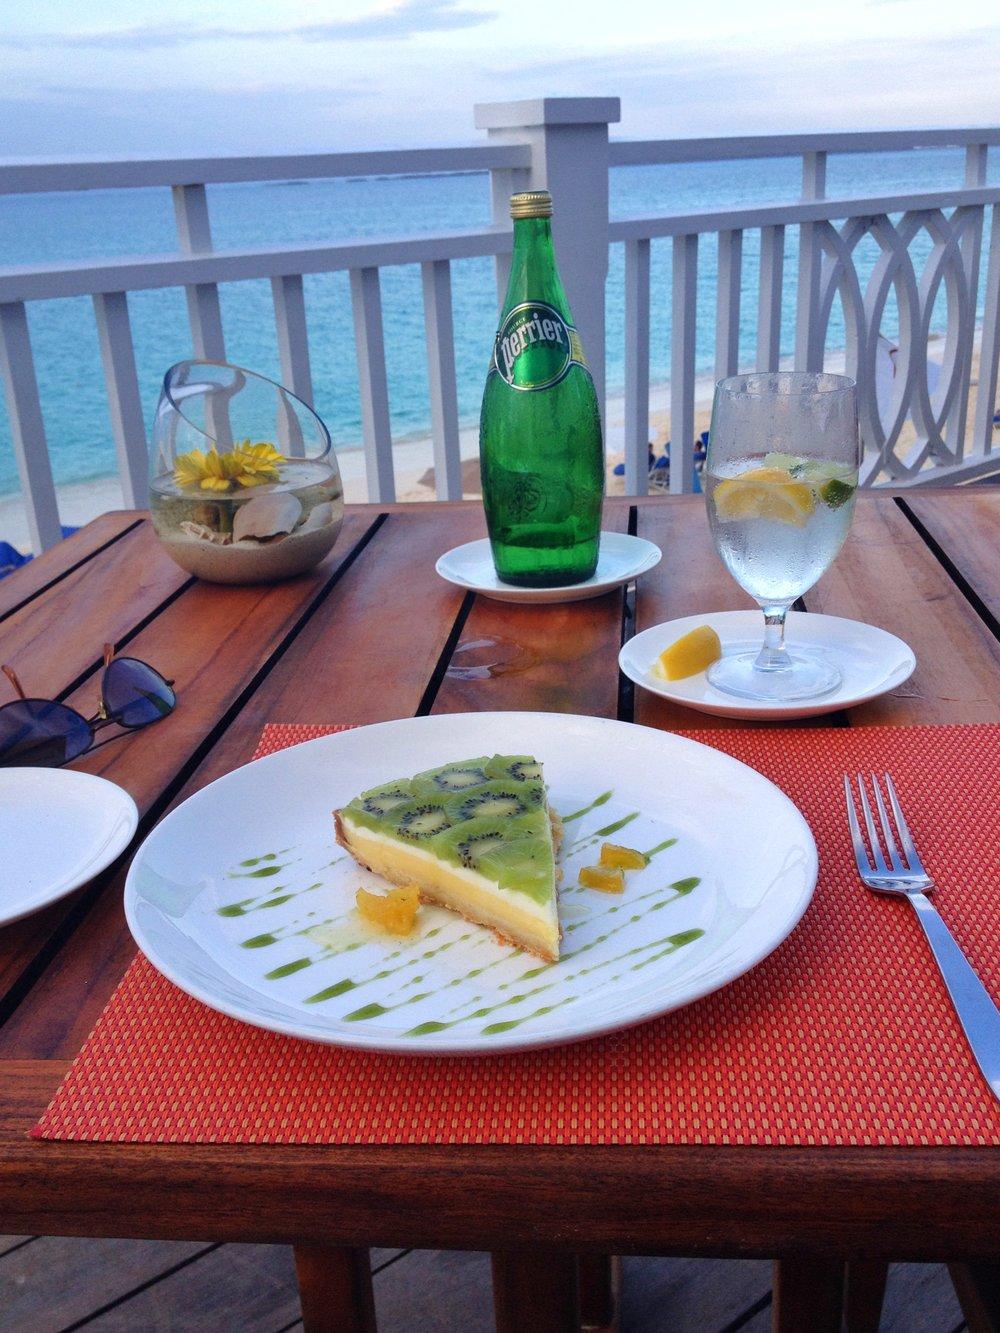 JasonShow 9 Eating at Ocean Club in the Bahamas.jpg